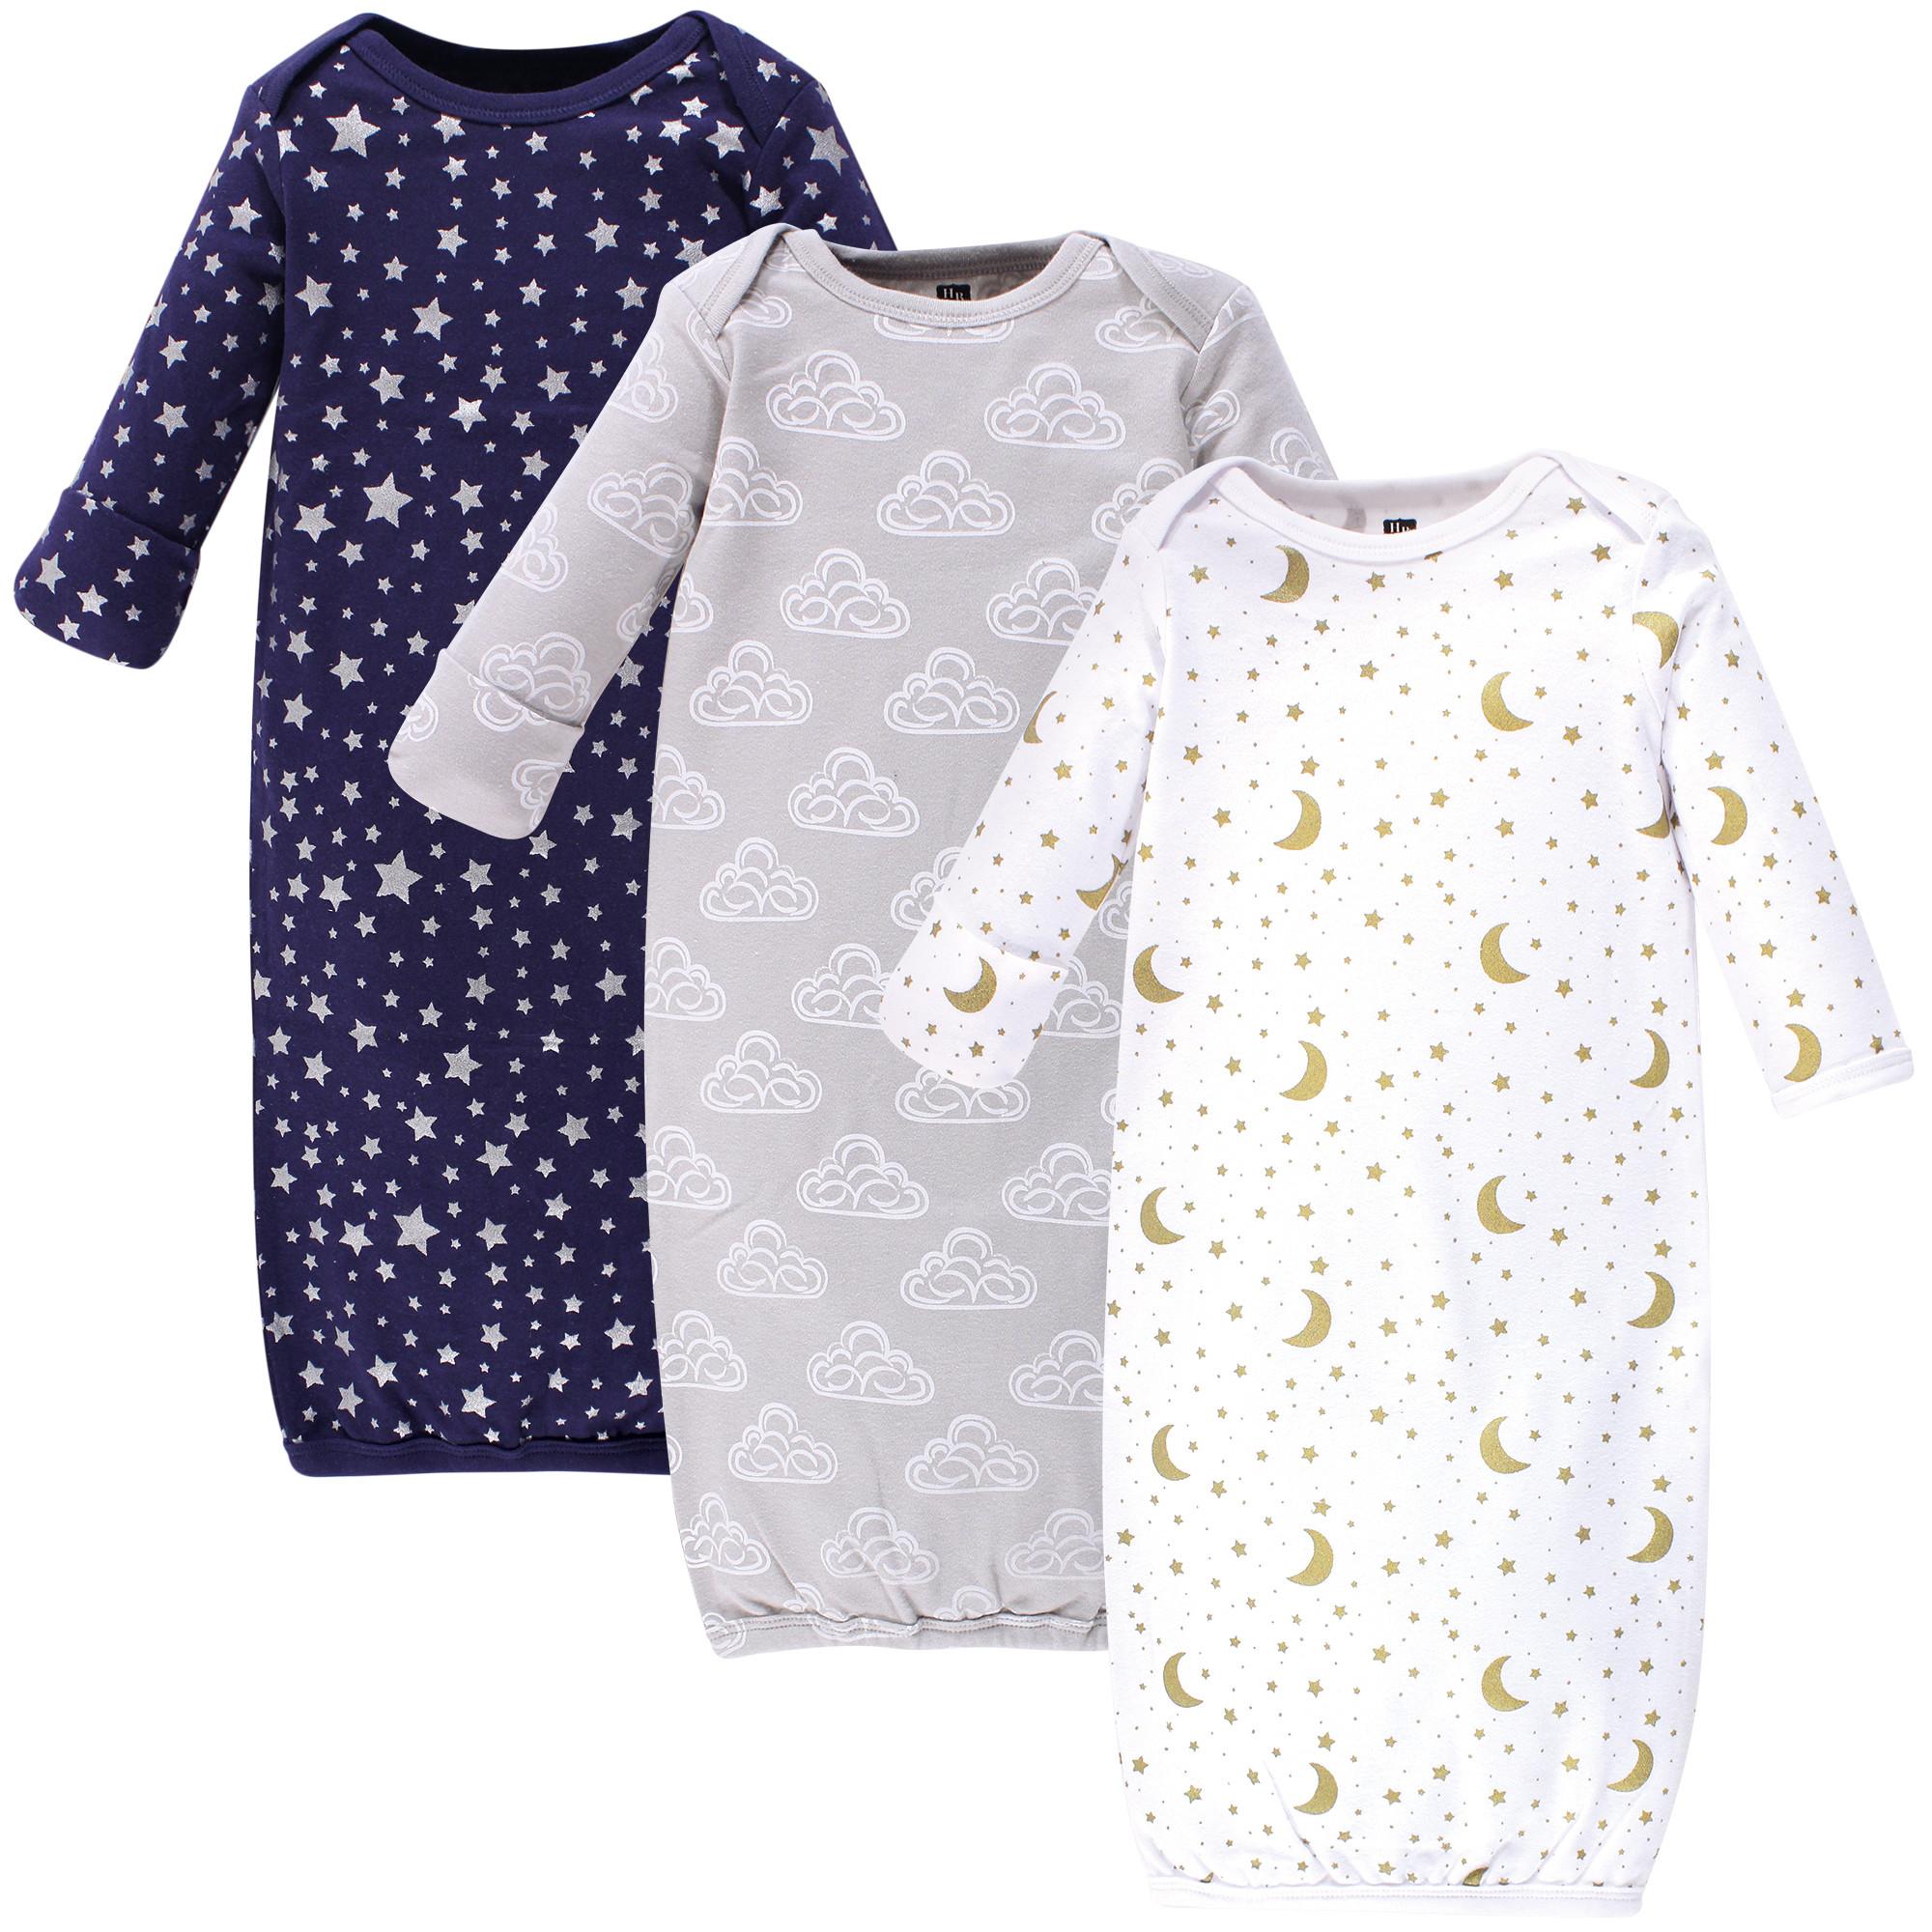 c7ca415906b0 3-Pack Rib Knit Infant Gowns